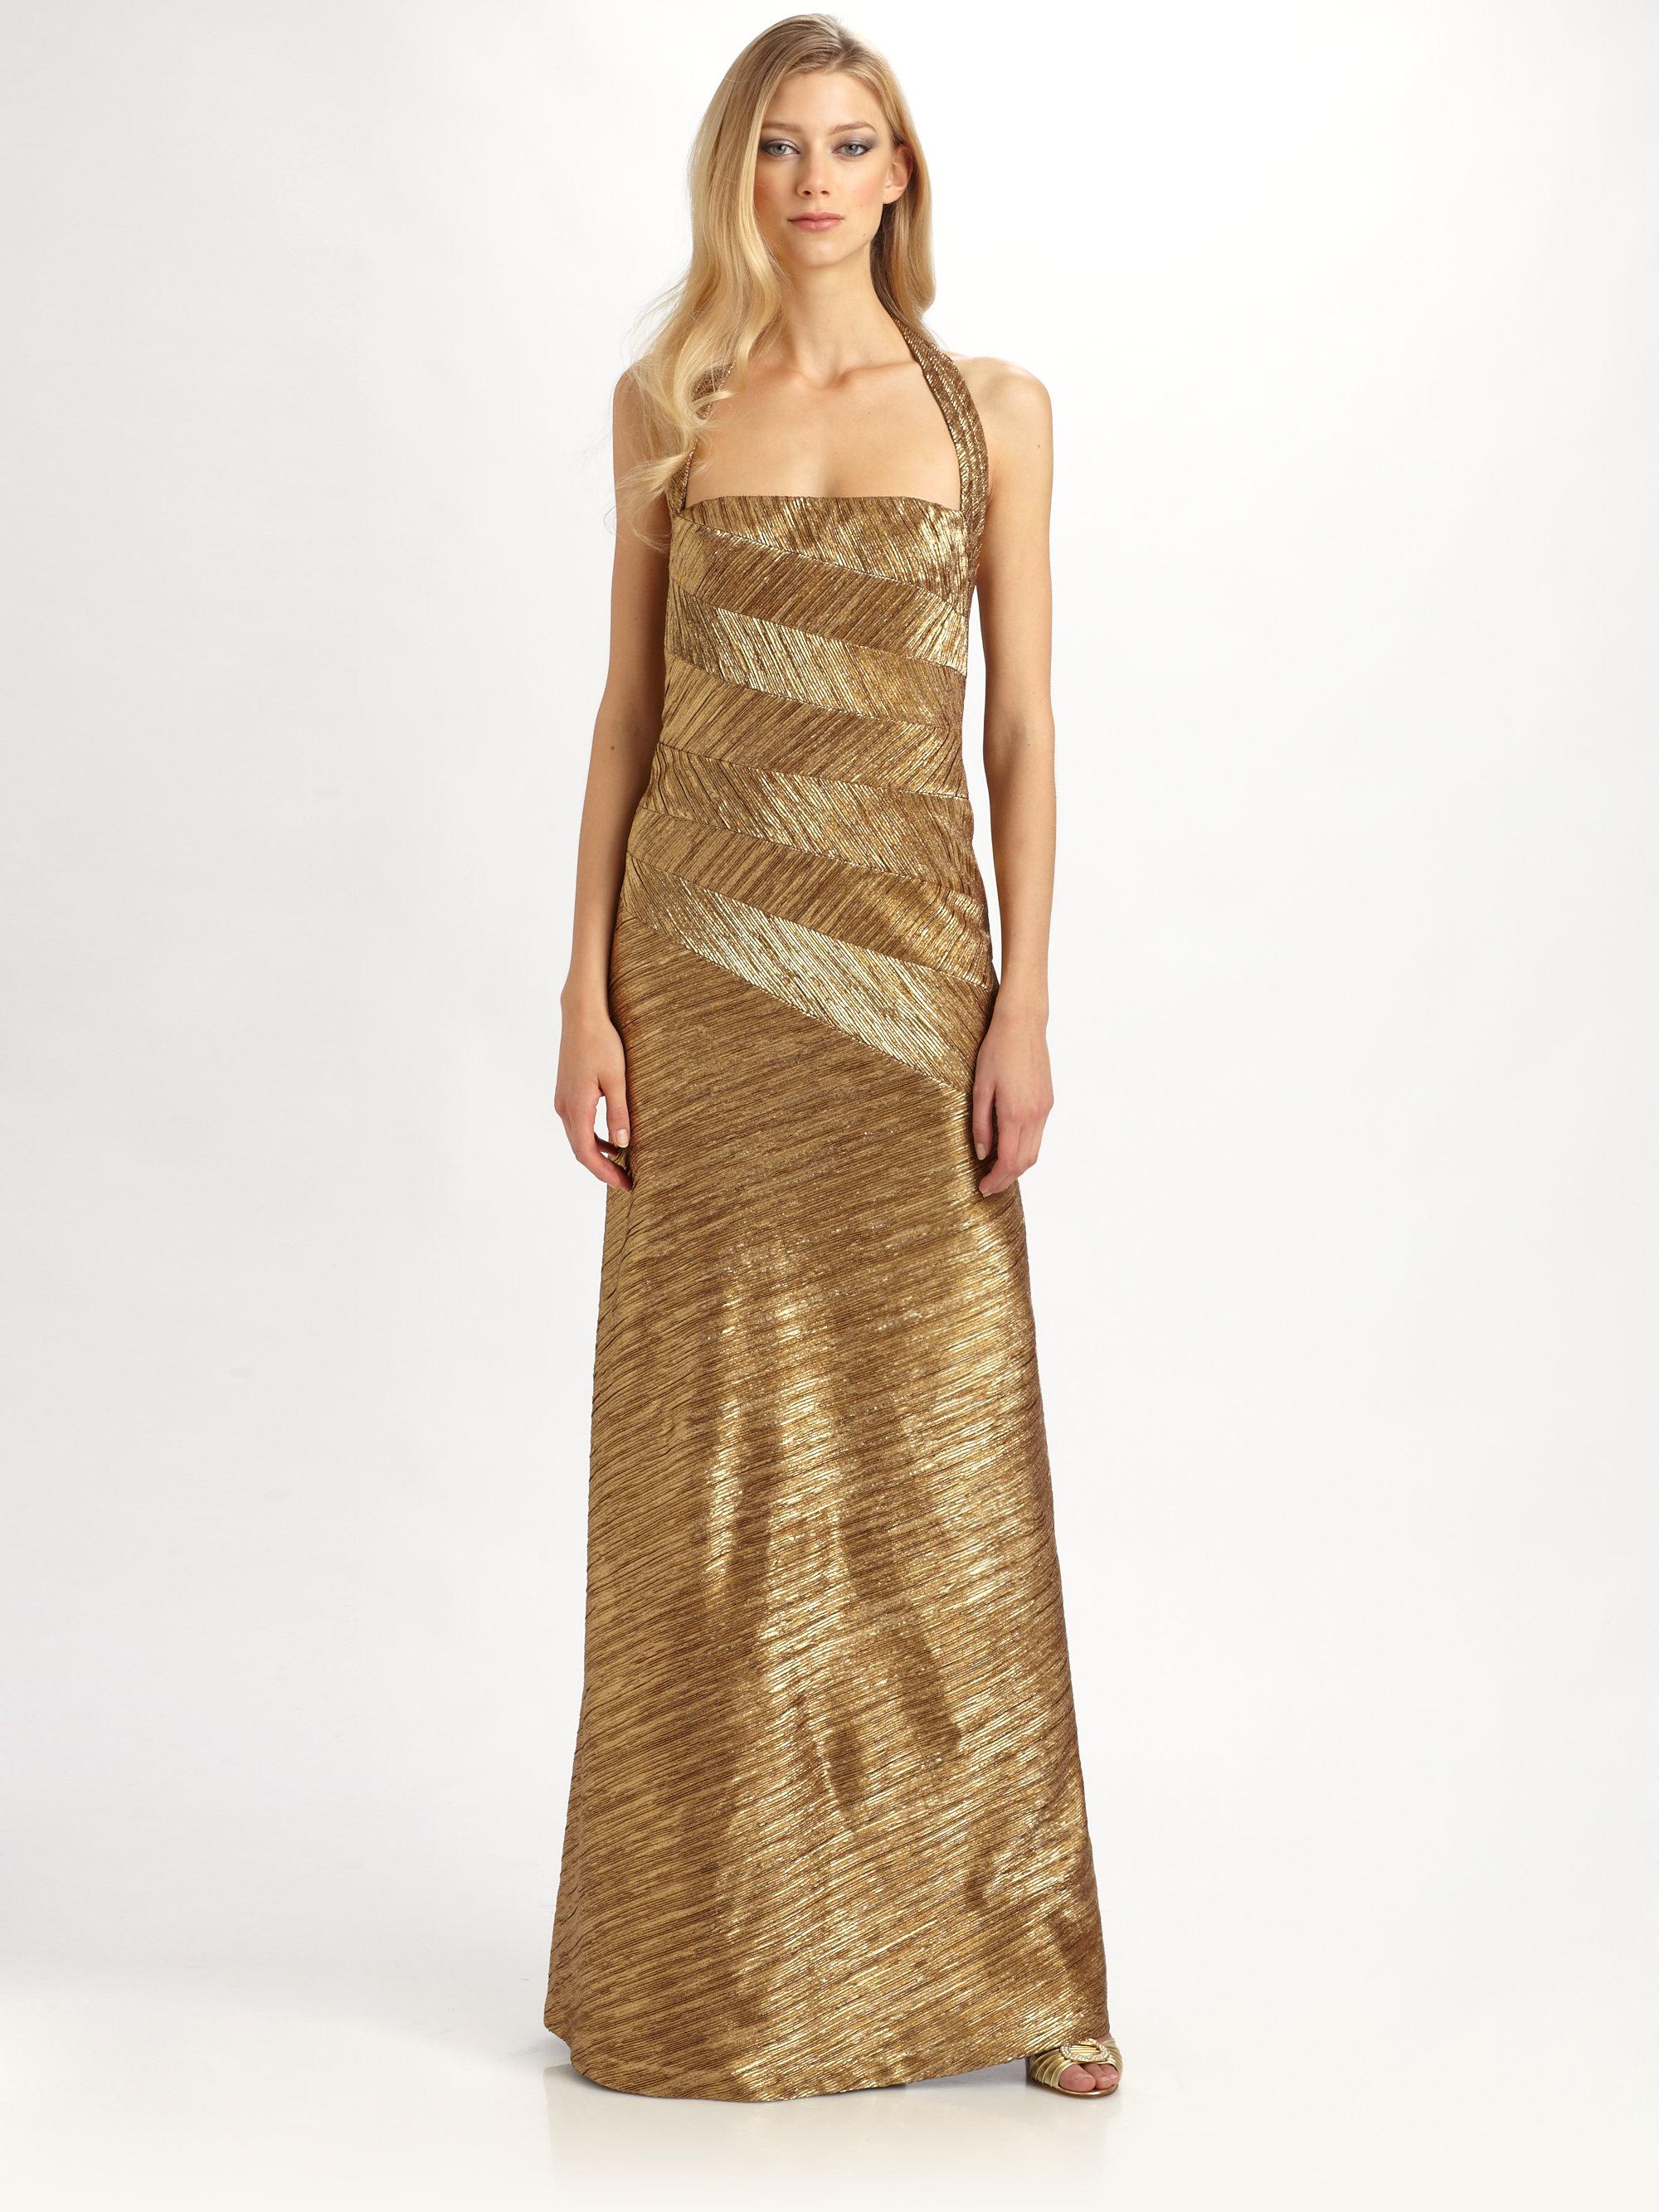 Lyst - Kay Unger Metallic Gown in Brown